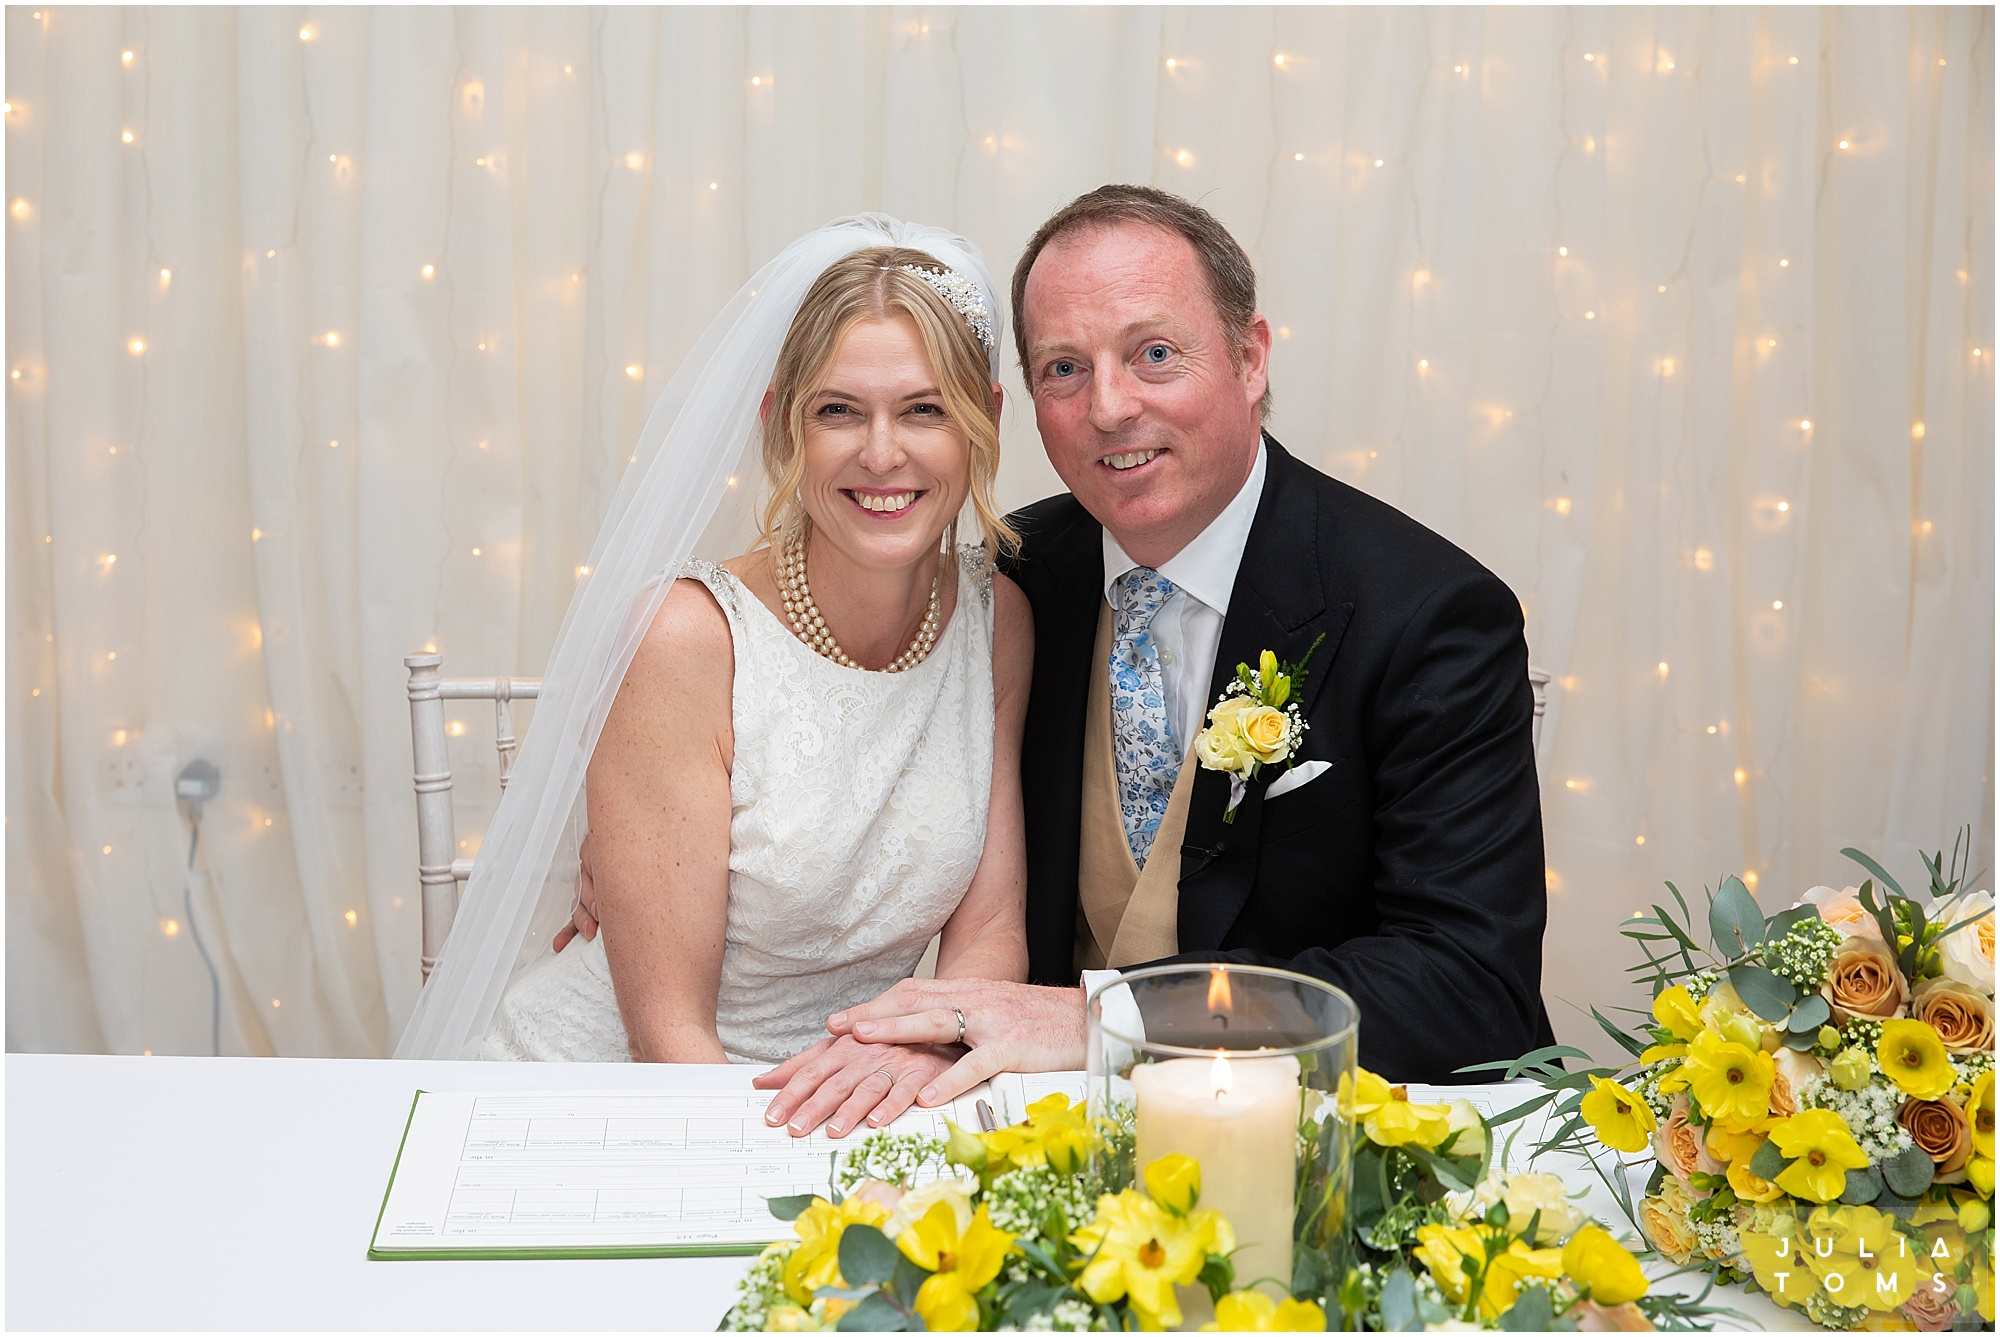 farbridge_barn_wedding_photographer_chichester_021.jpg